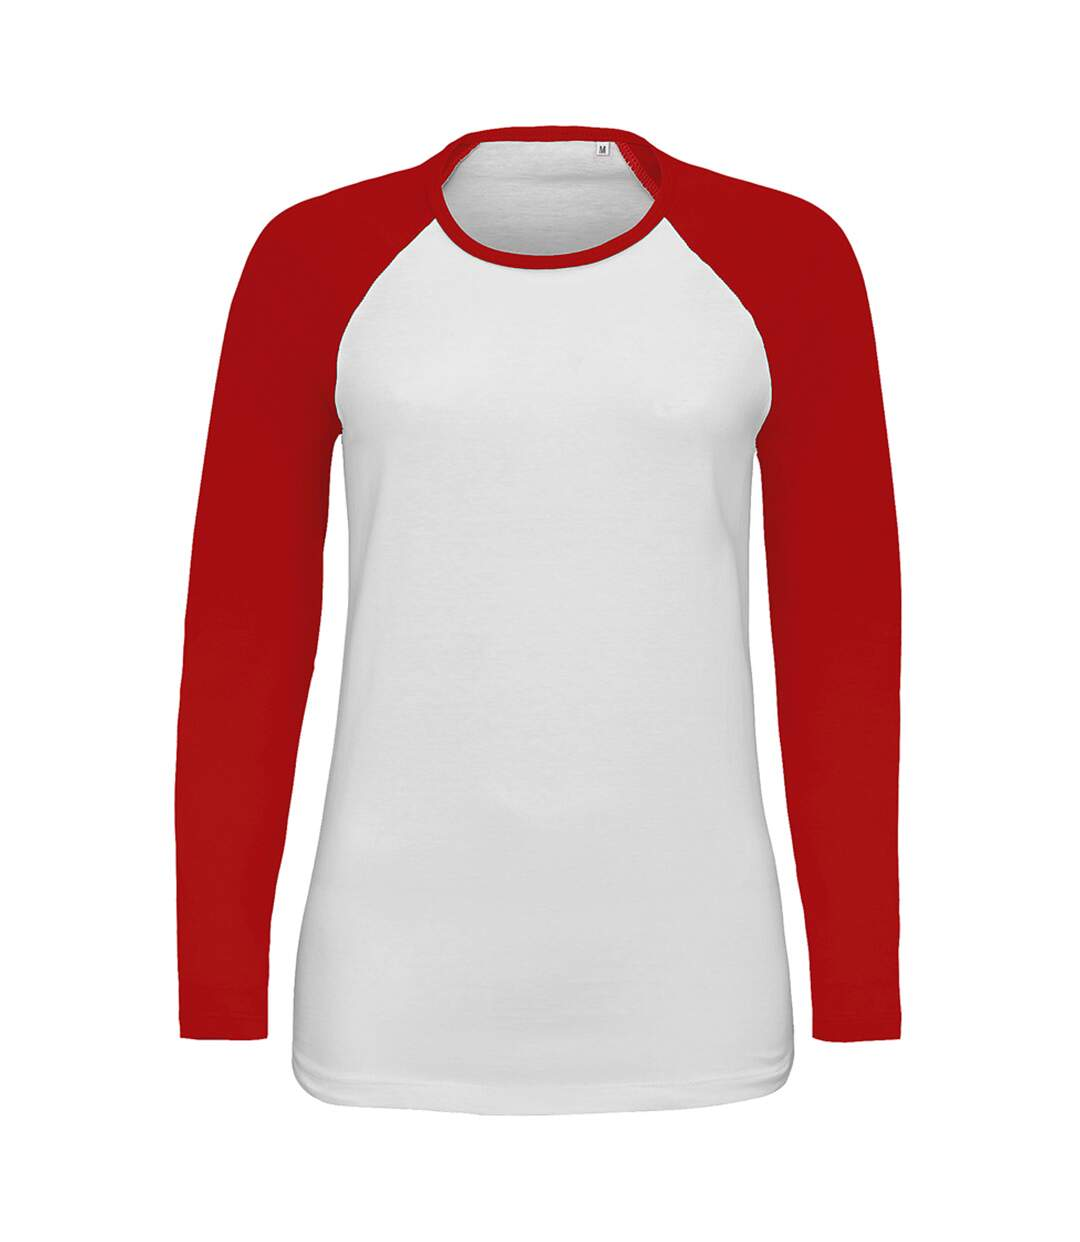 Sols - Tee-Shirt Milky - Femme (Blanc / rouge) - UTPC3514